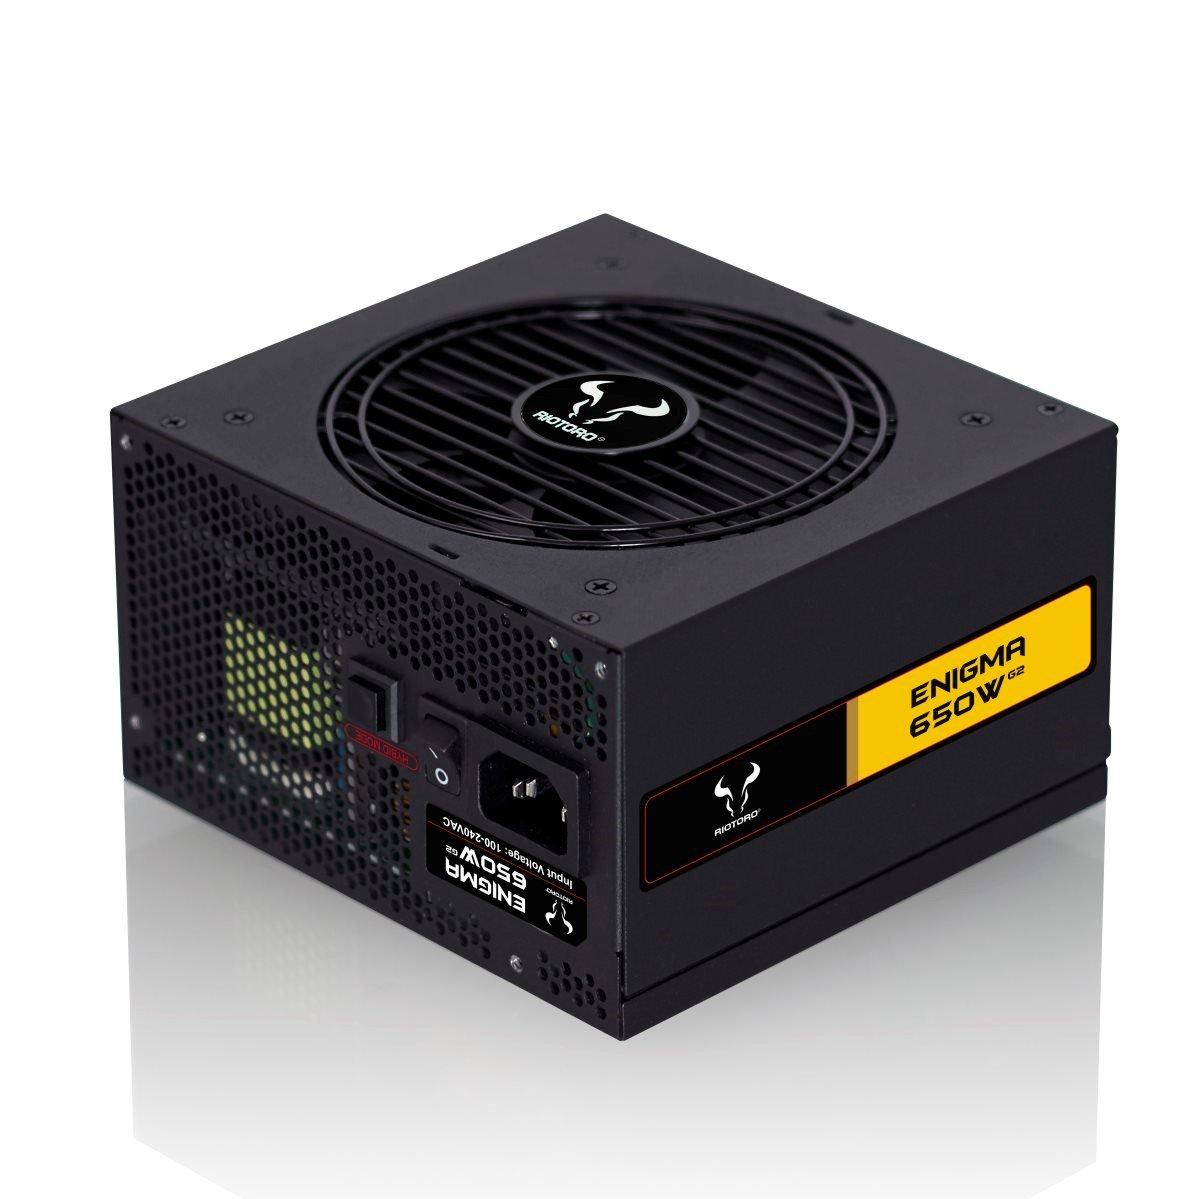 Riotoro Enigma G2 650W Modular 80+ Gold PSU - (PSU1500) - £59.99 delivered @ CCLOnline